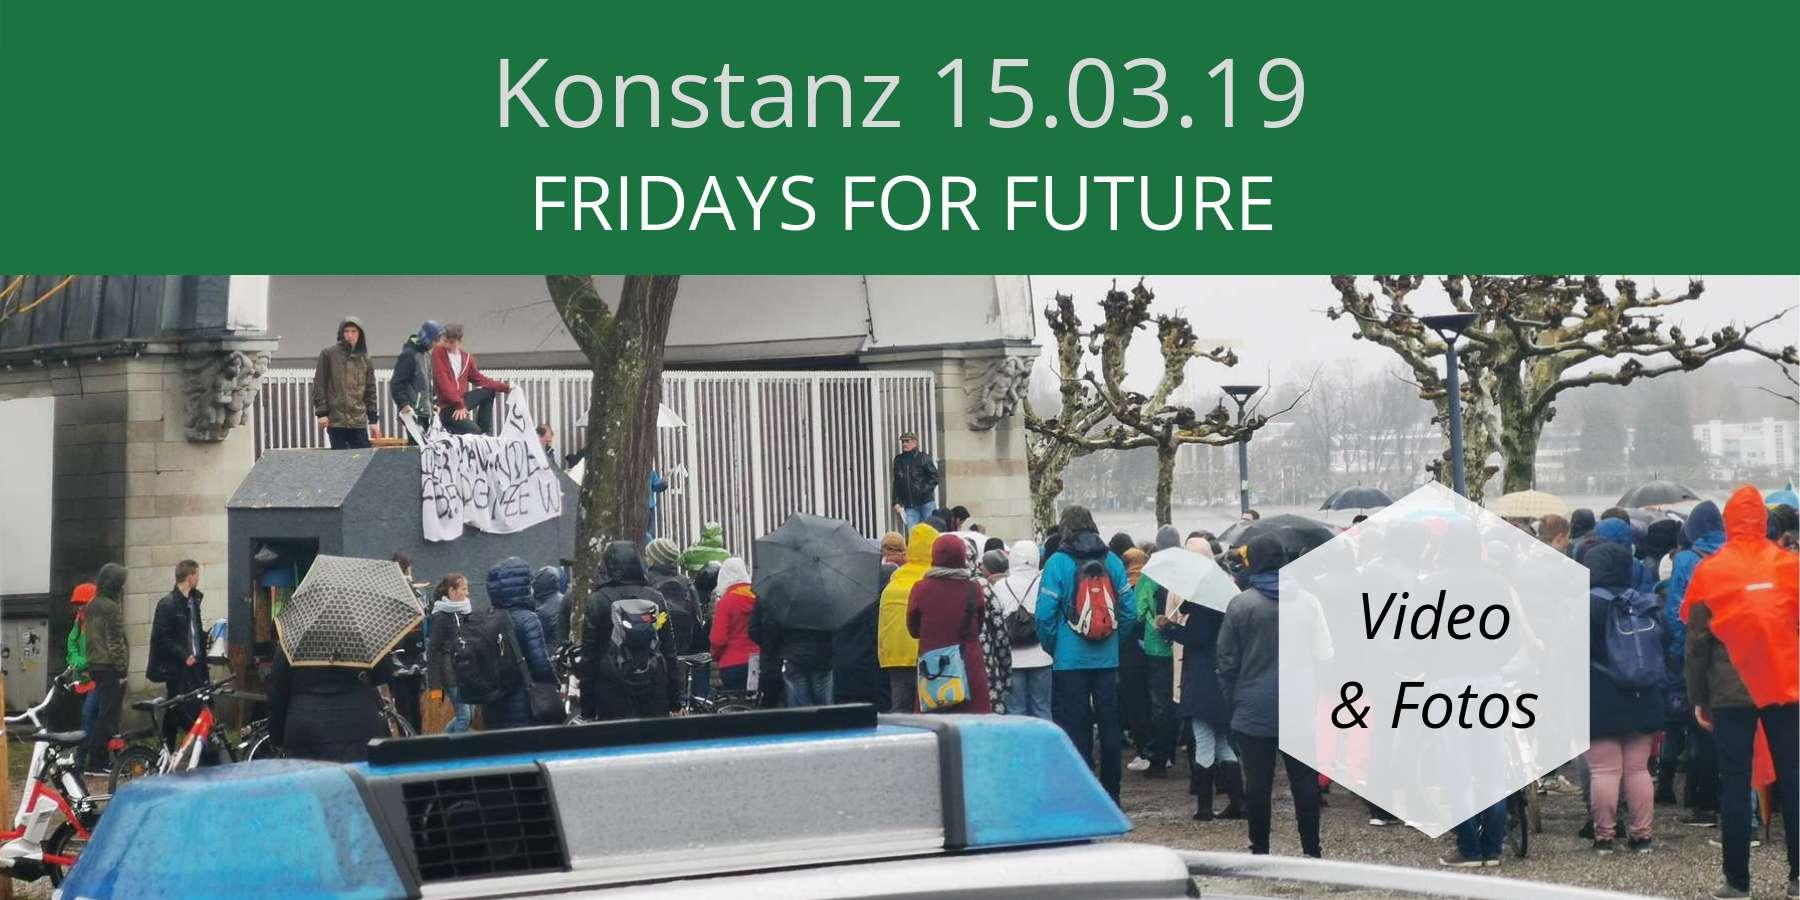 Blogtitel Fridays for future konstanz 15.03.19